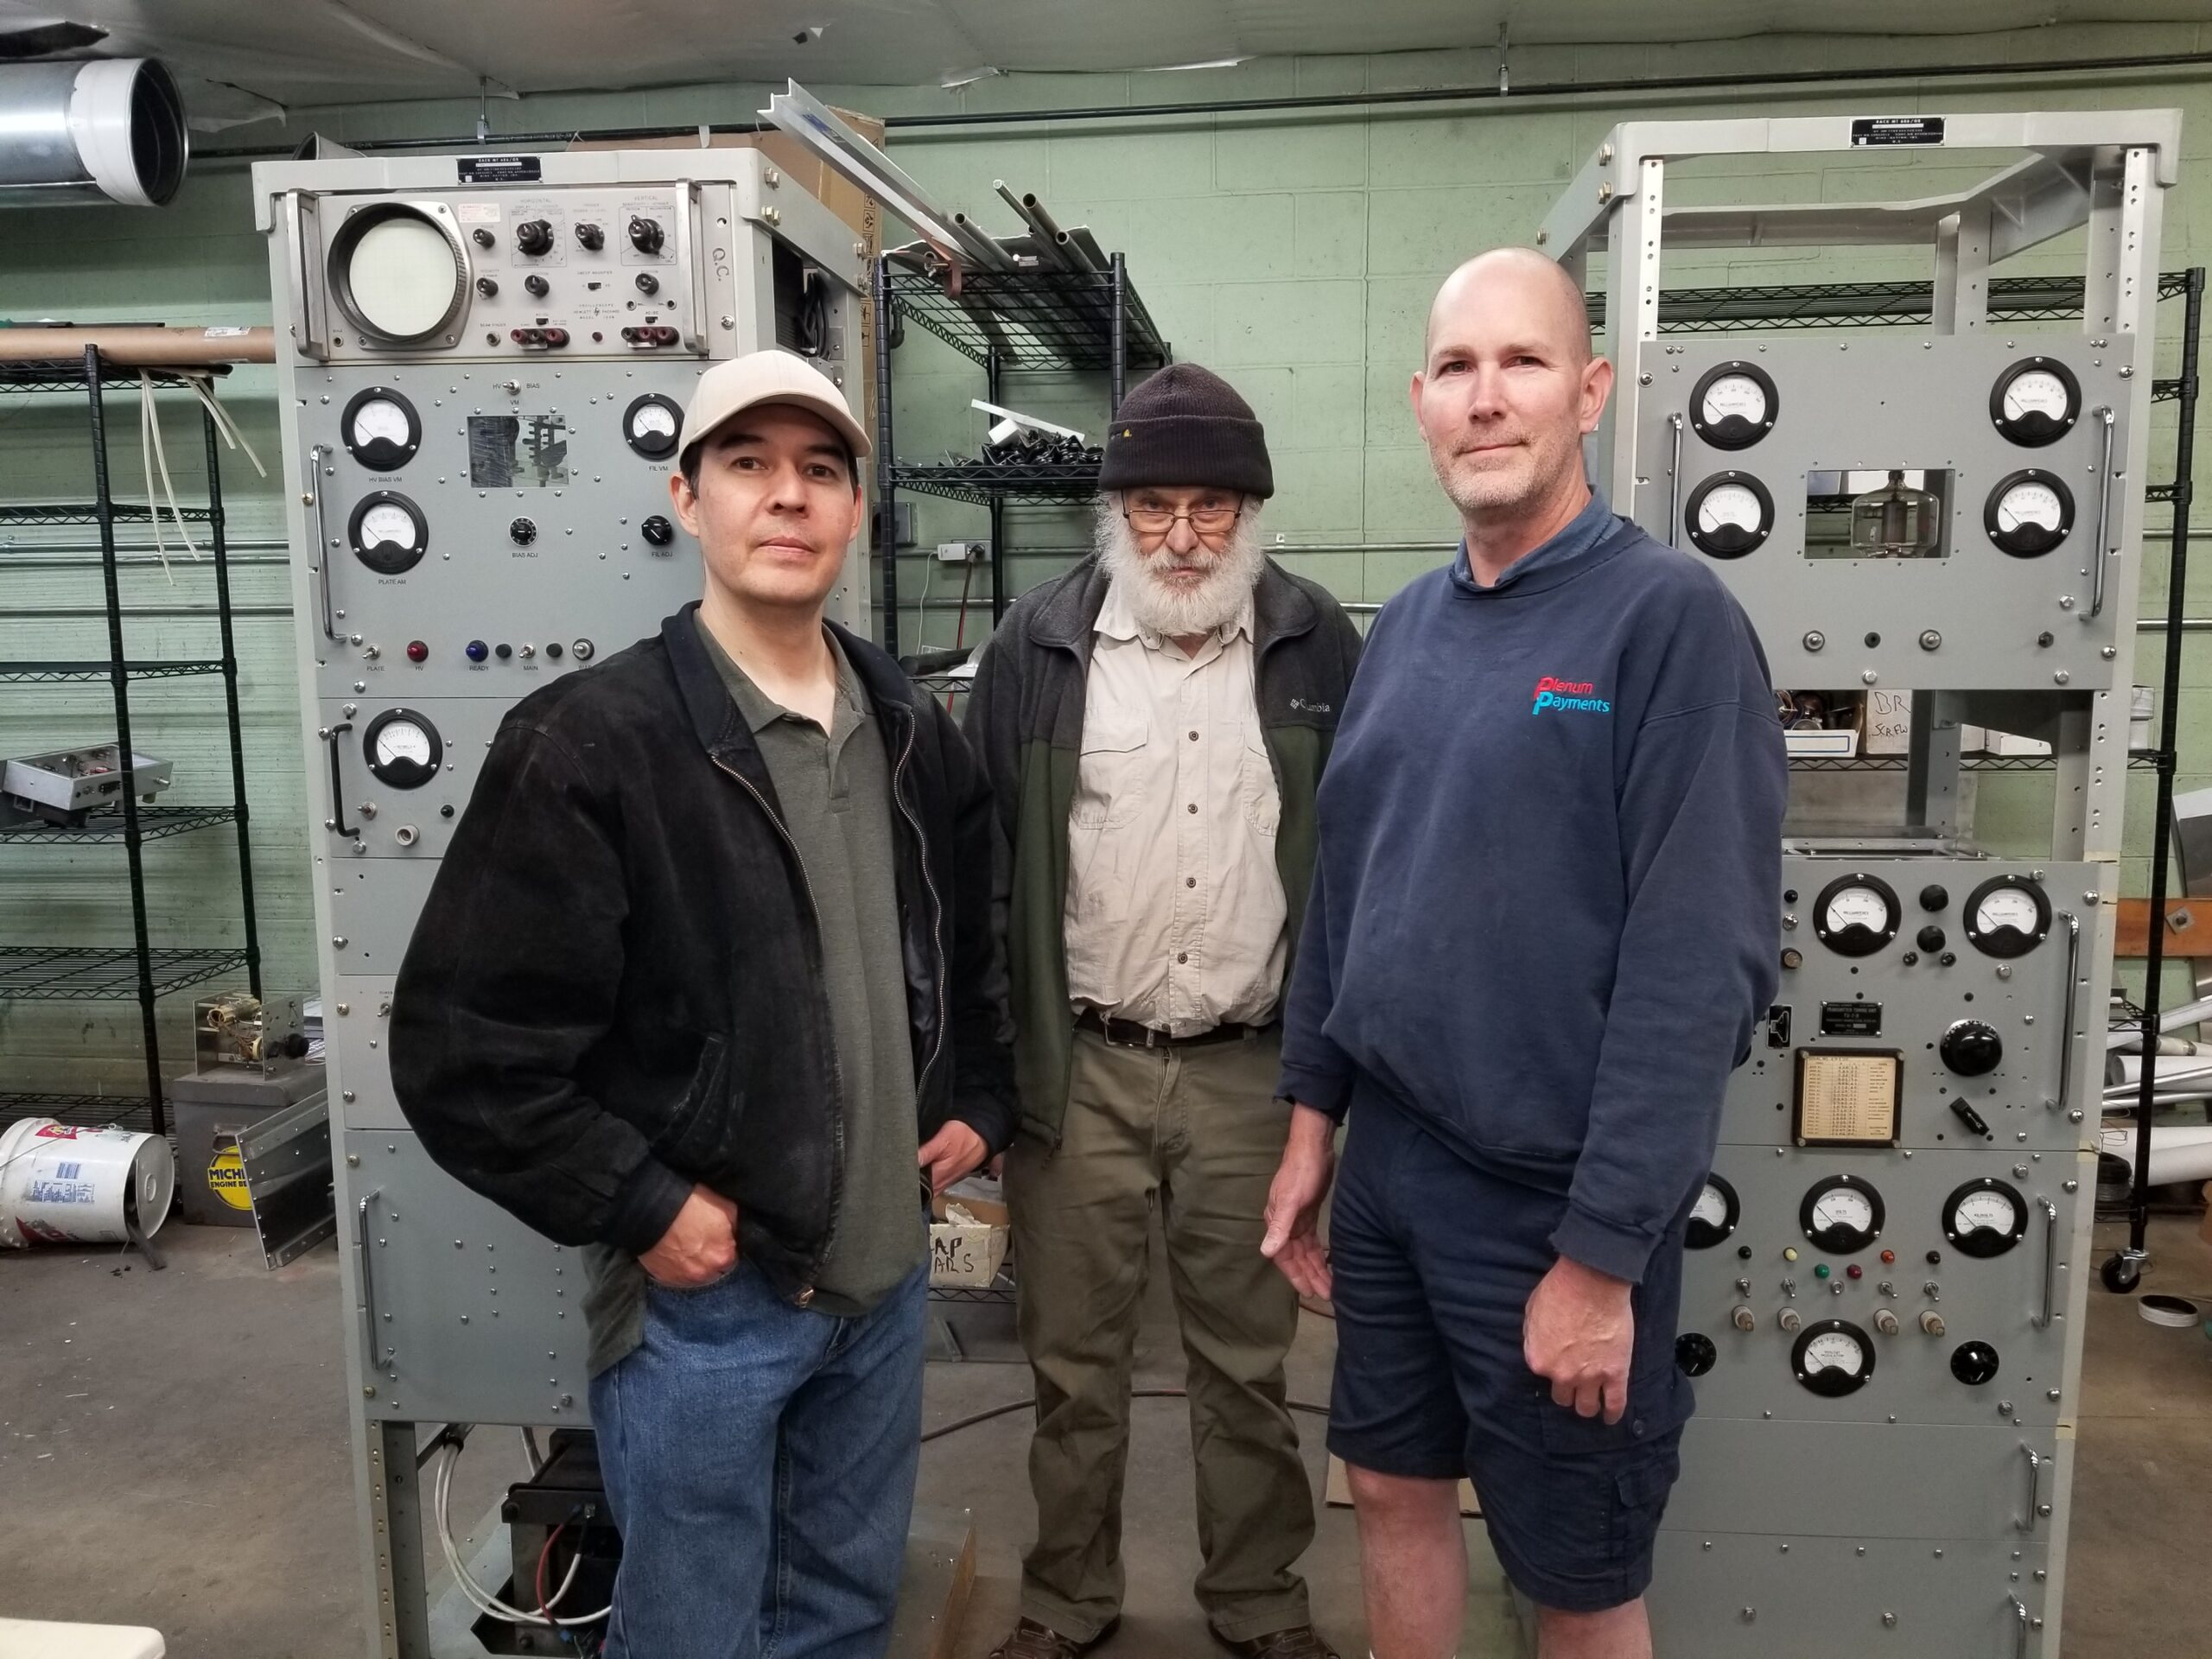 Aaron Murakami, Eric Dollard, Jeff Moe, Cosmic Induction Generator